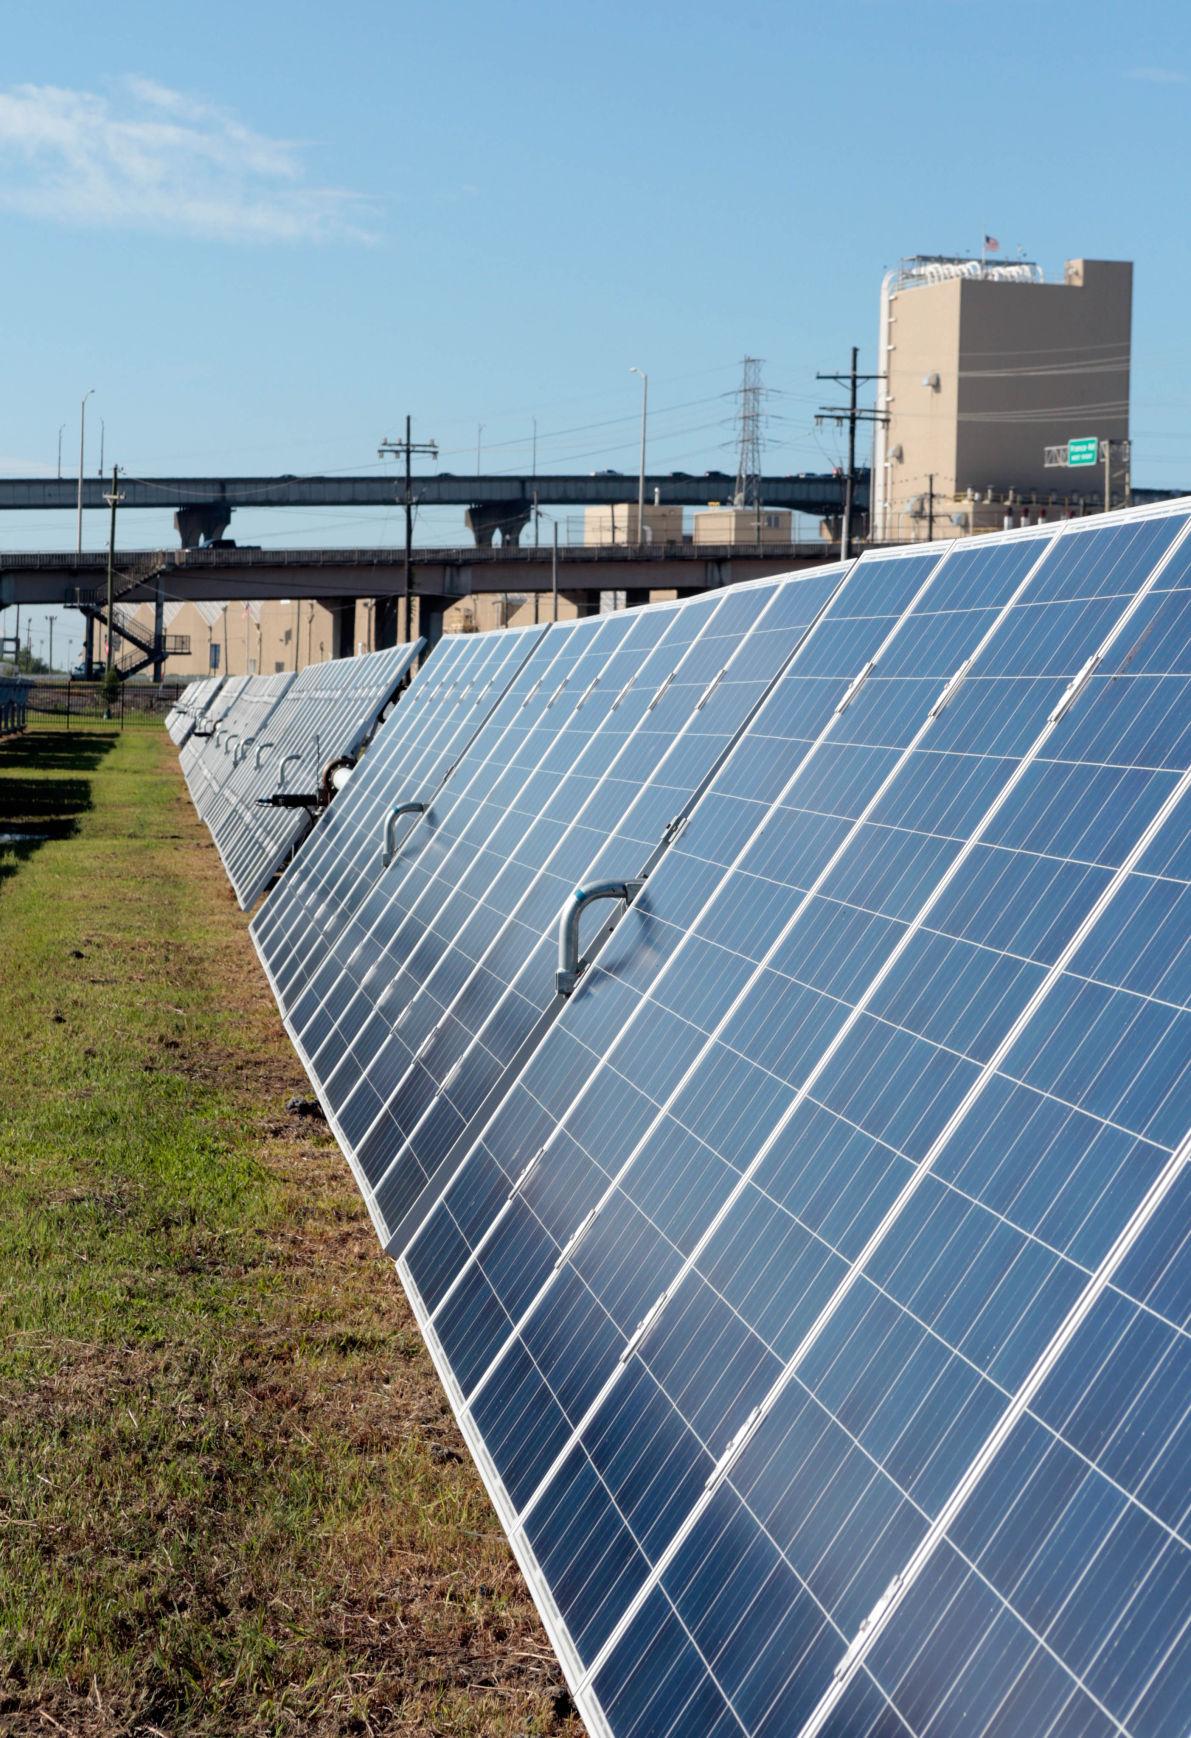 Solarplant59036 Jpg